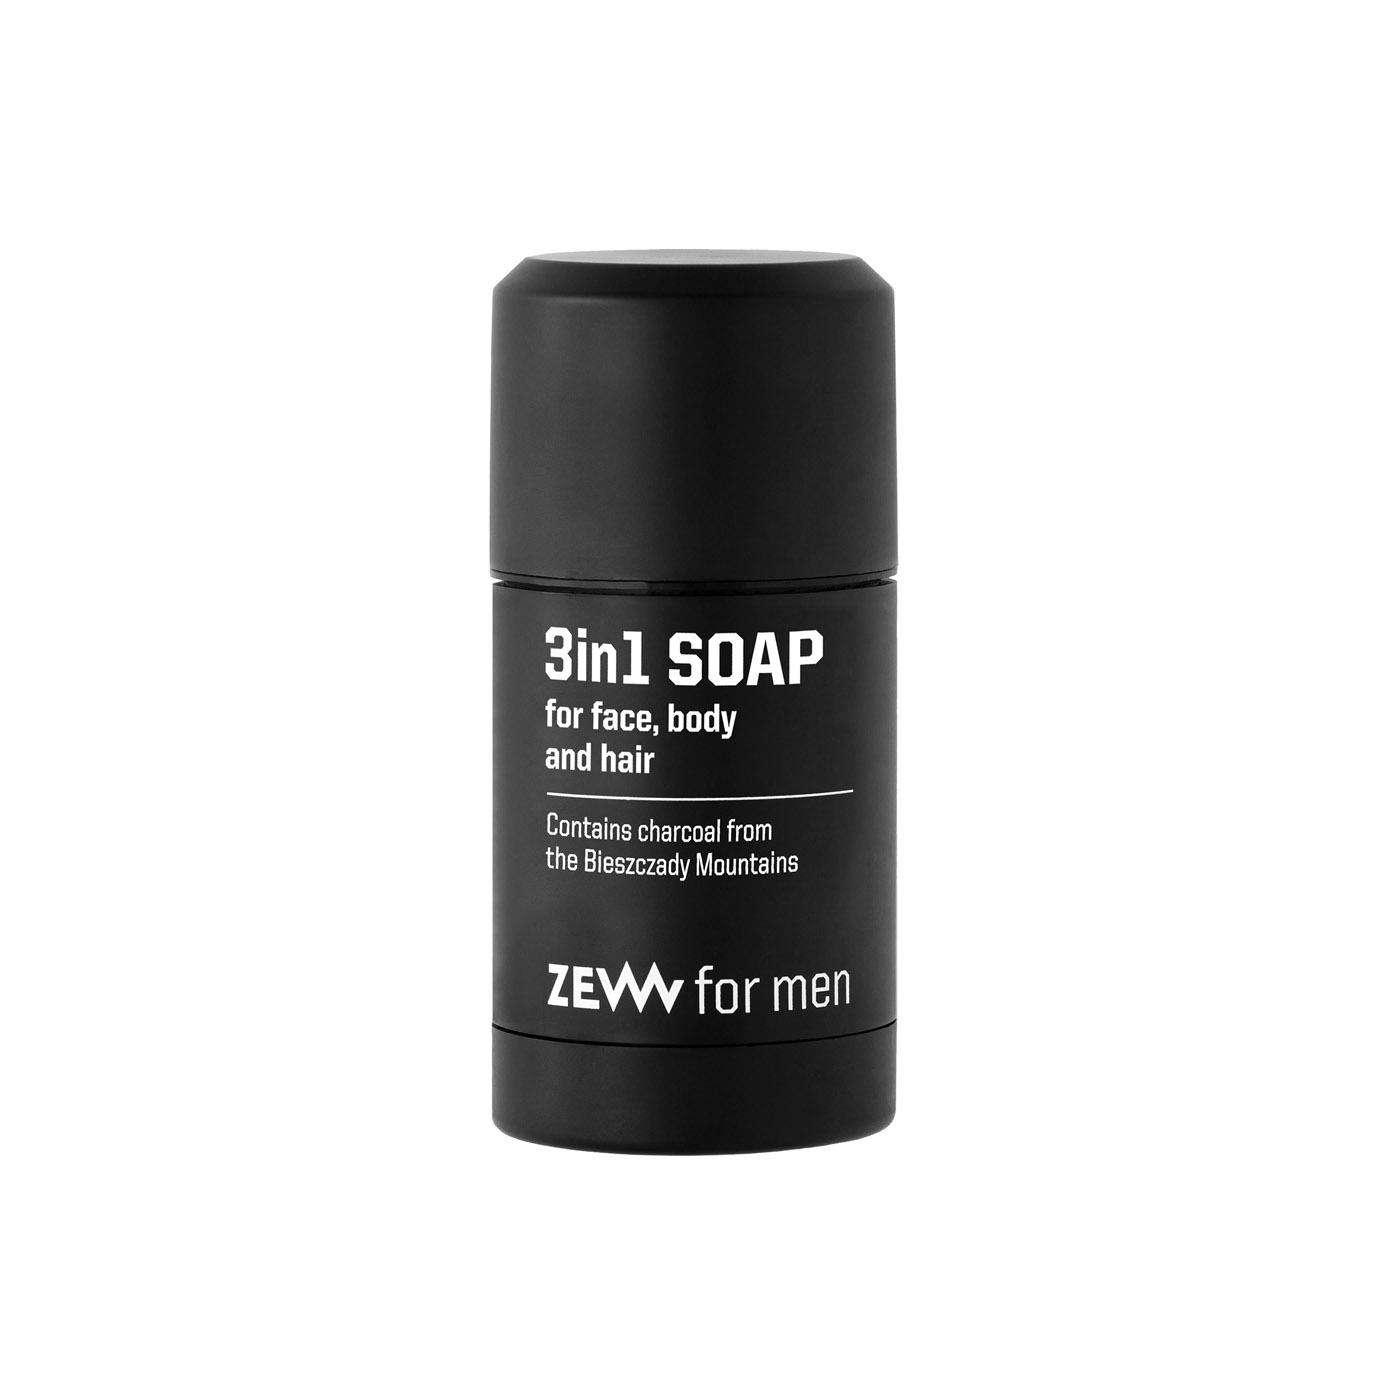 ZEW for men 3 in 1 soap: body, face and hair - mydlo 3v1 na telo, tvár a vlasy s dreveným uhlím, 85 ml + vrecko M